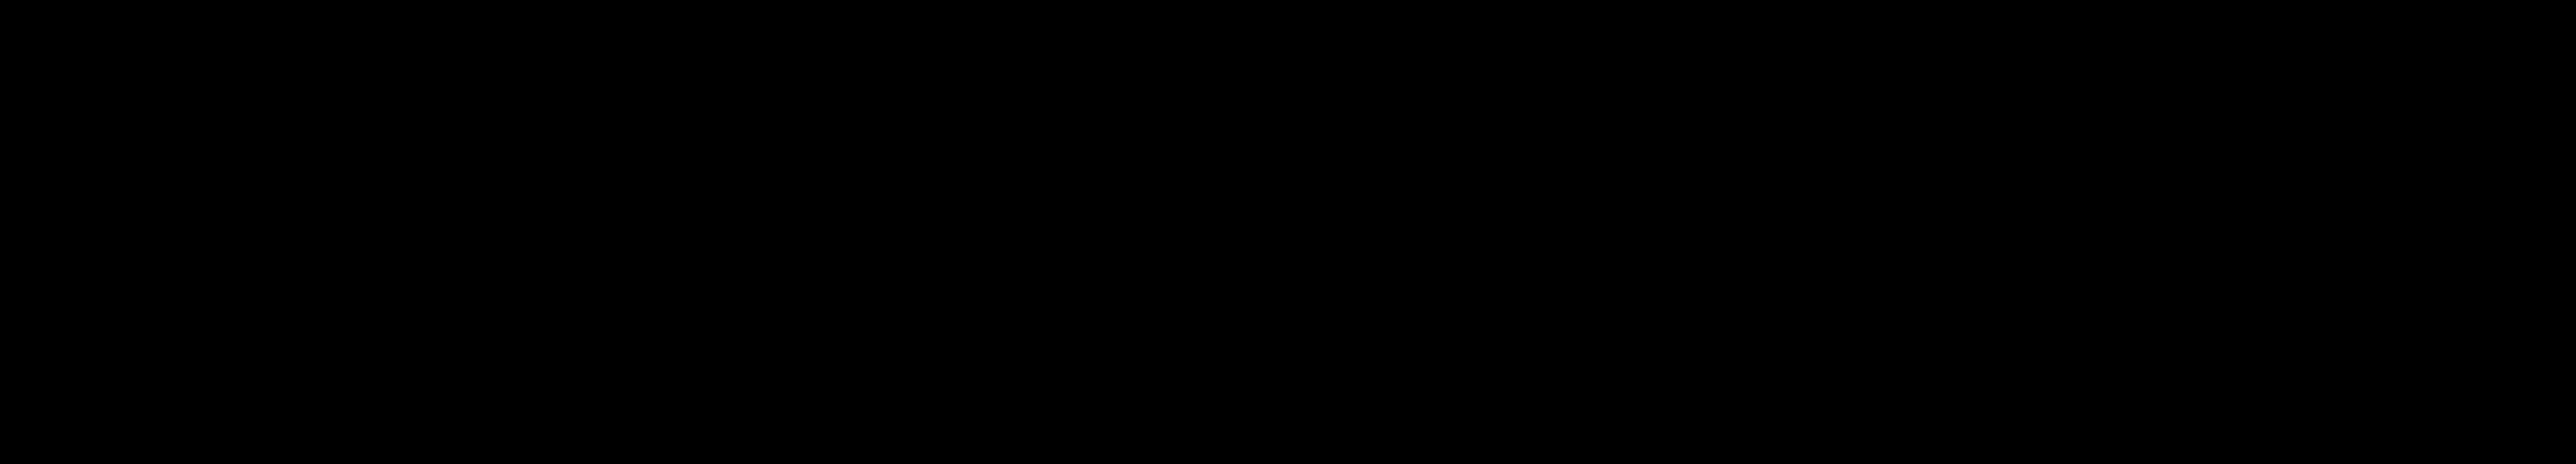 Campania-tagline-Main-logo-H-N